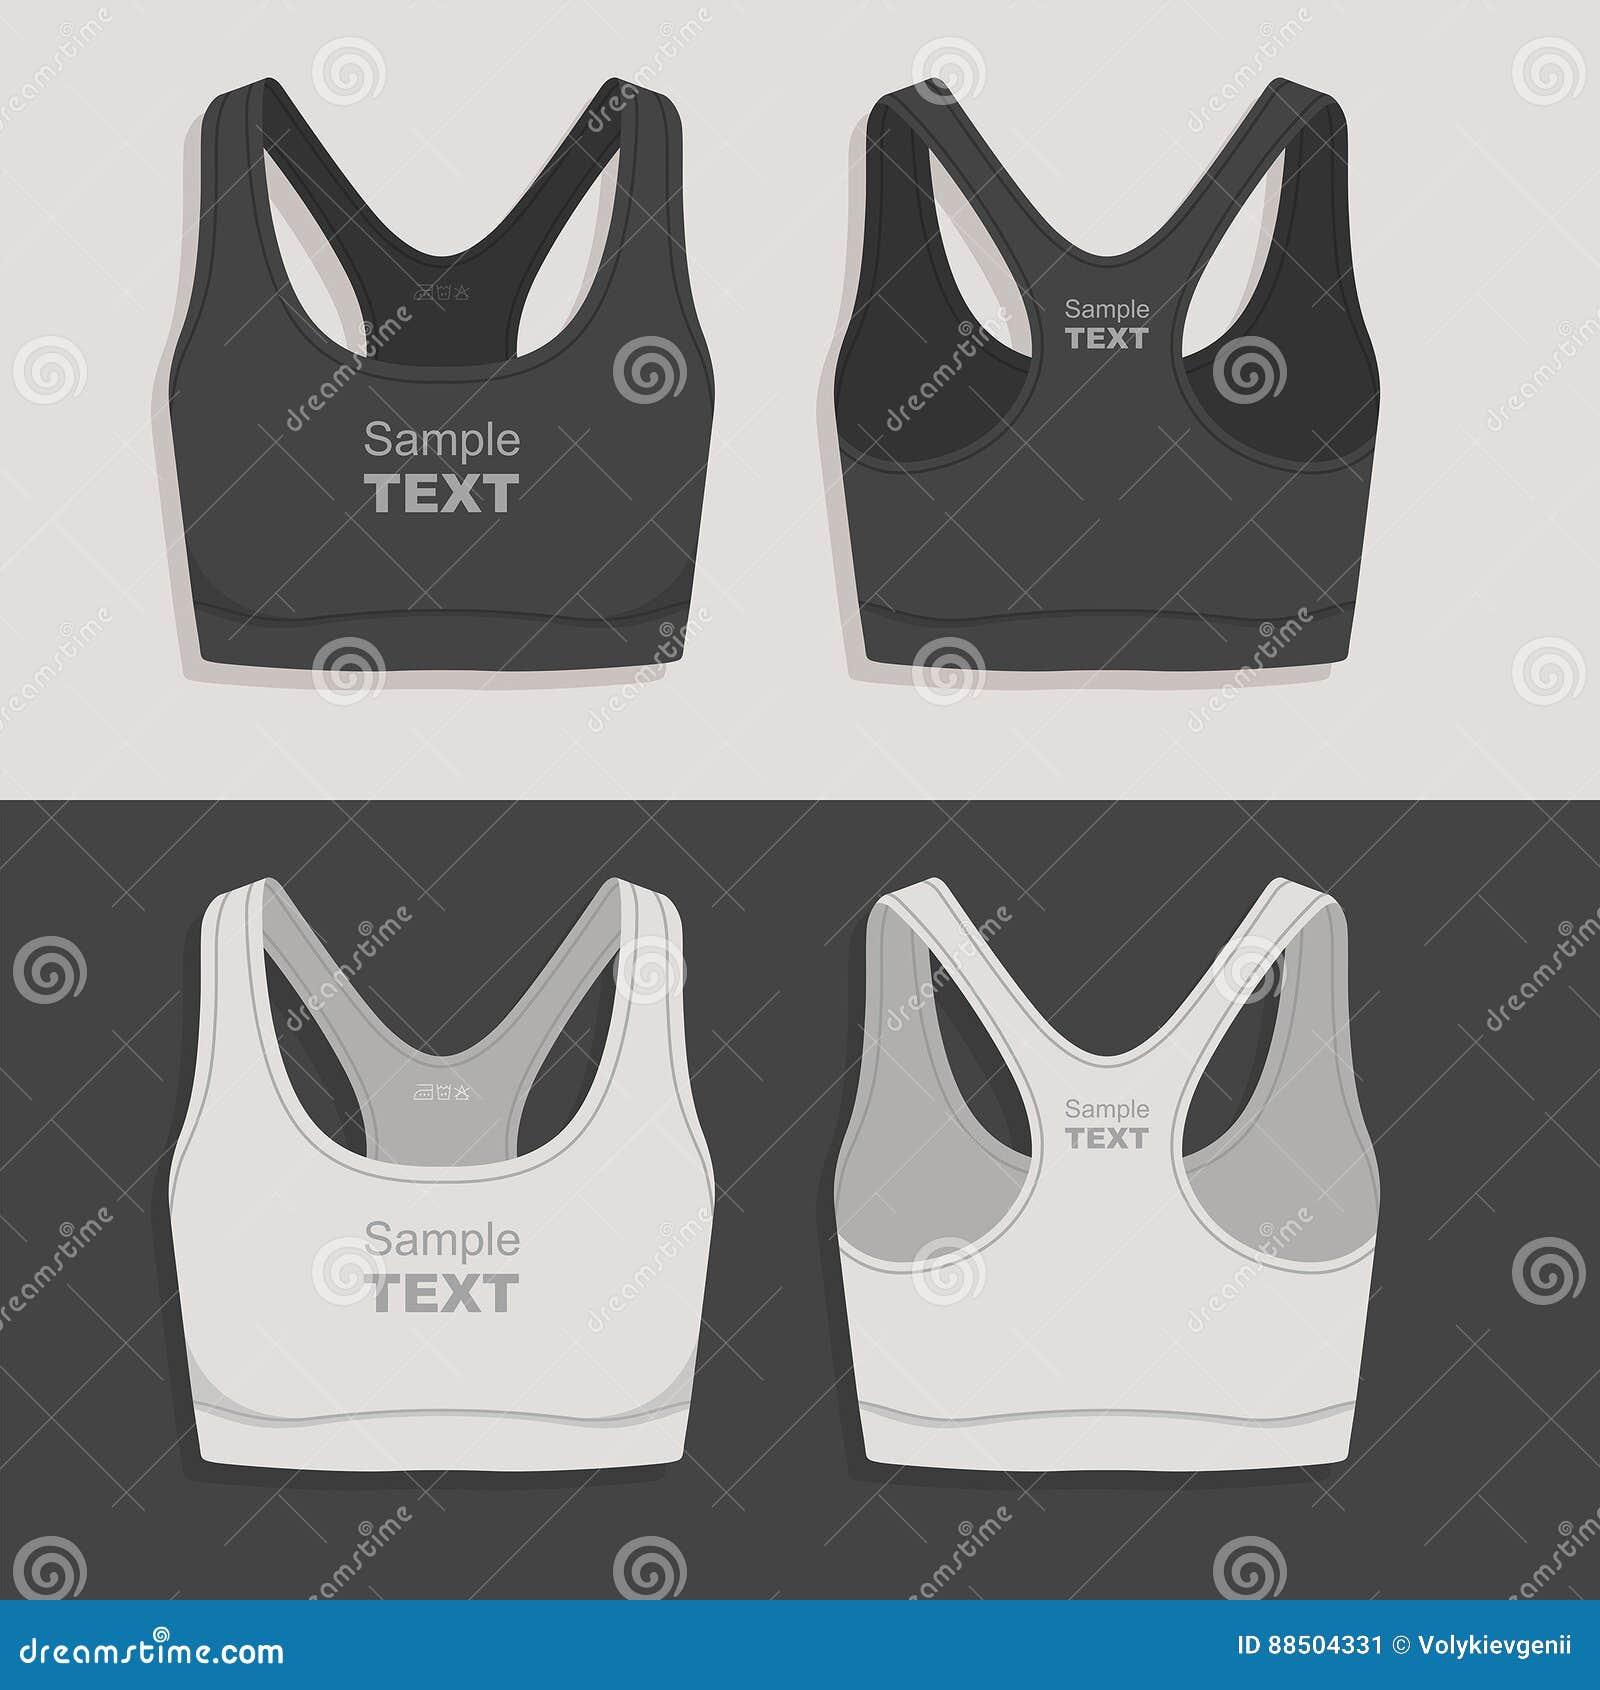 f7040ce6c1 Women sport bra stock vector. Illustration of torso